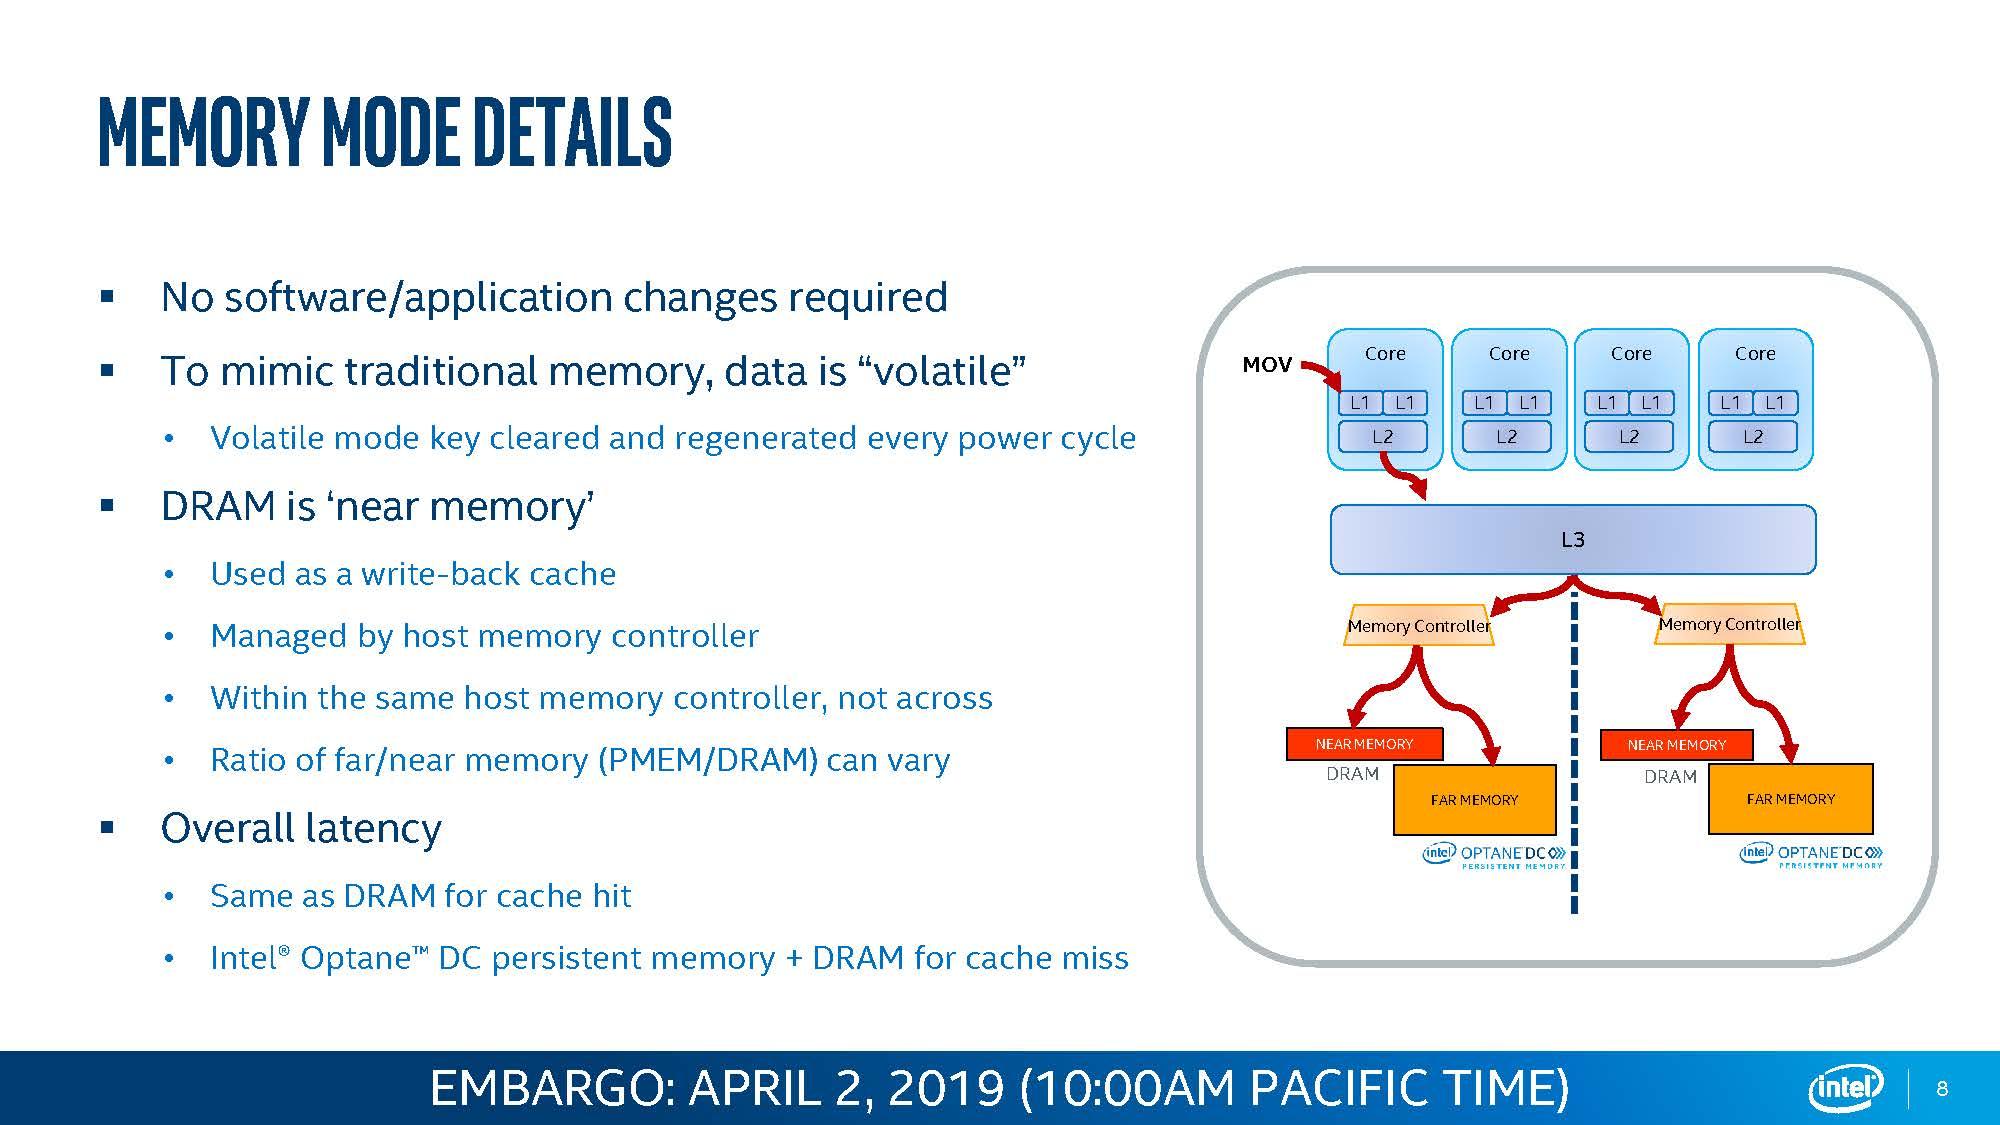 Intel Optane DCPMM Memory Mode Details